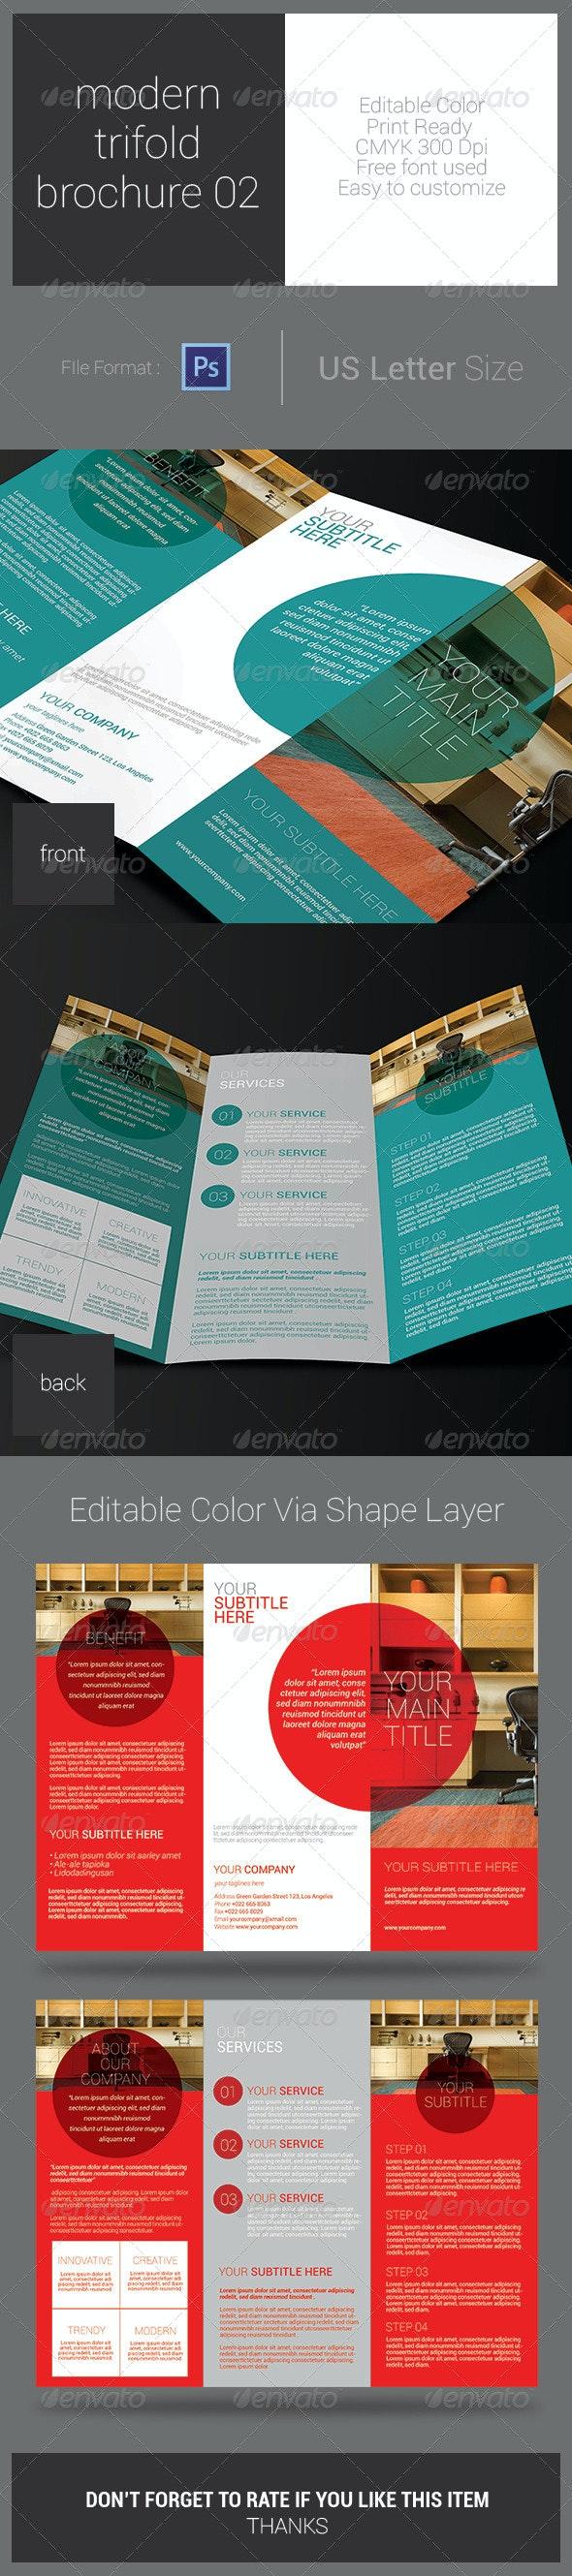 Modern Trifold Brochure 02 - Corporate Brochures